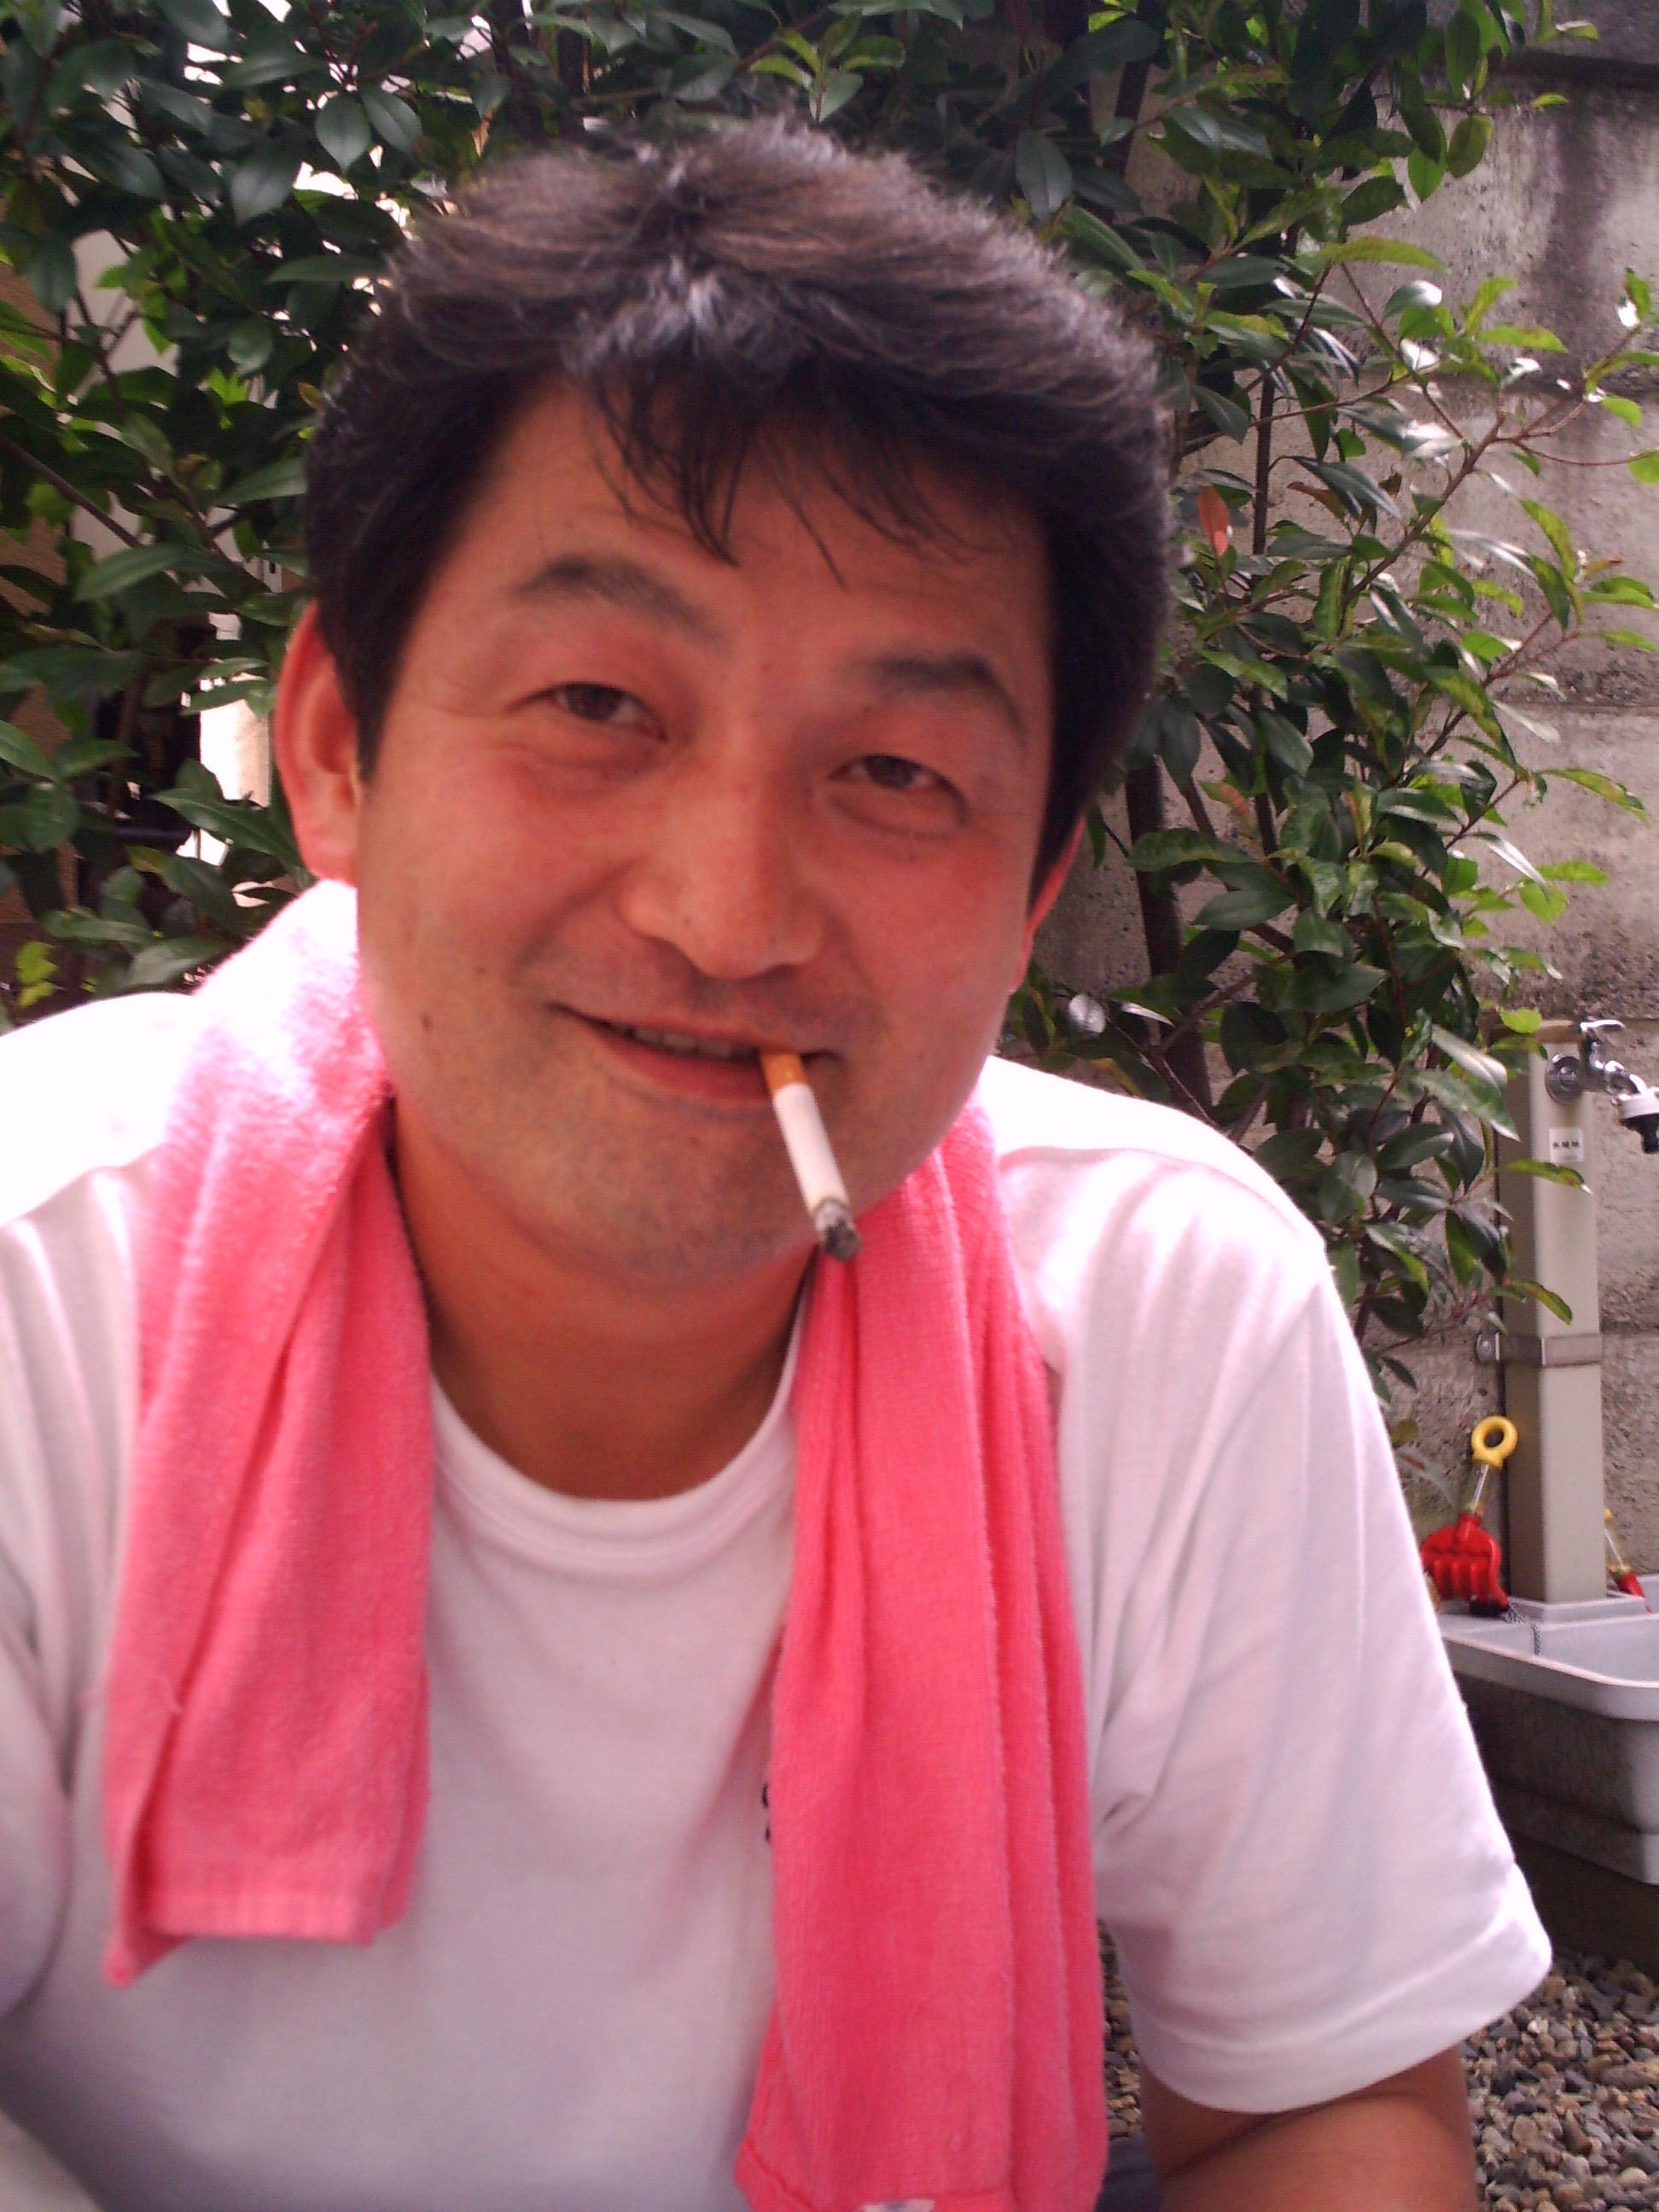 津田 健次 Kenji Tsuda